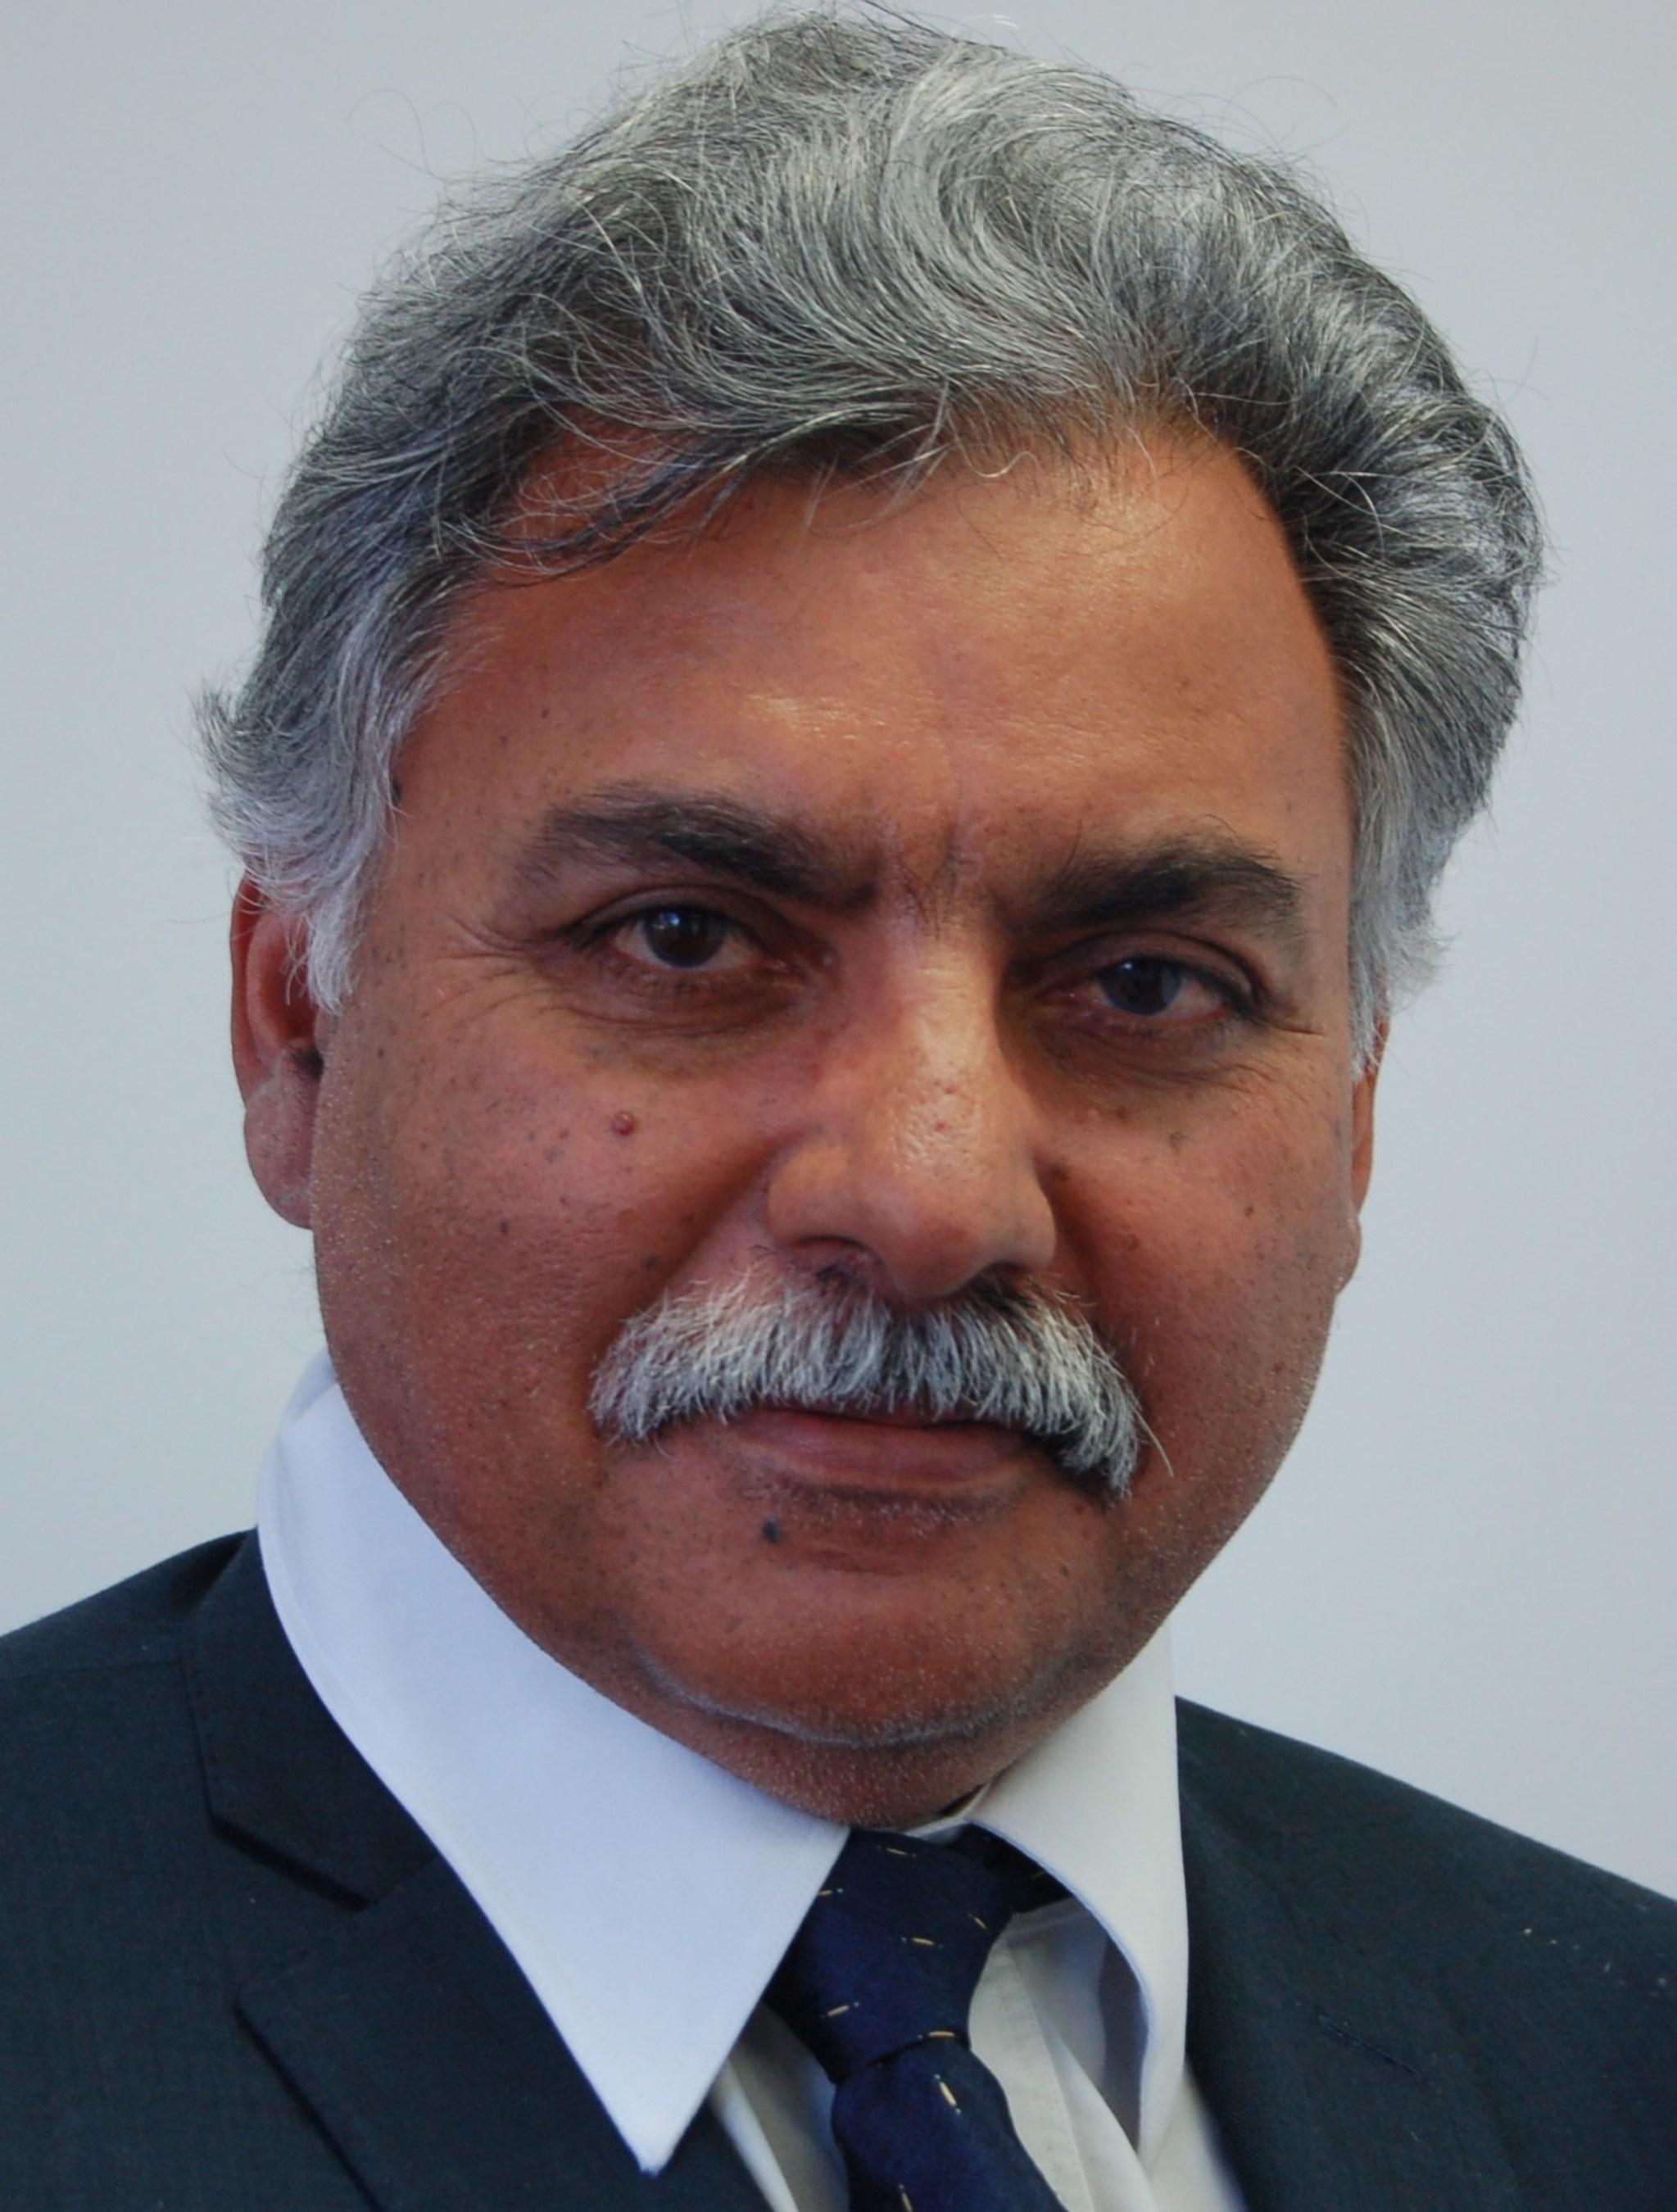 Maz Khan, Industry Director, Australia & New Zealand, Transformational Health, Frost & Sullivan